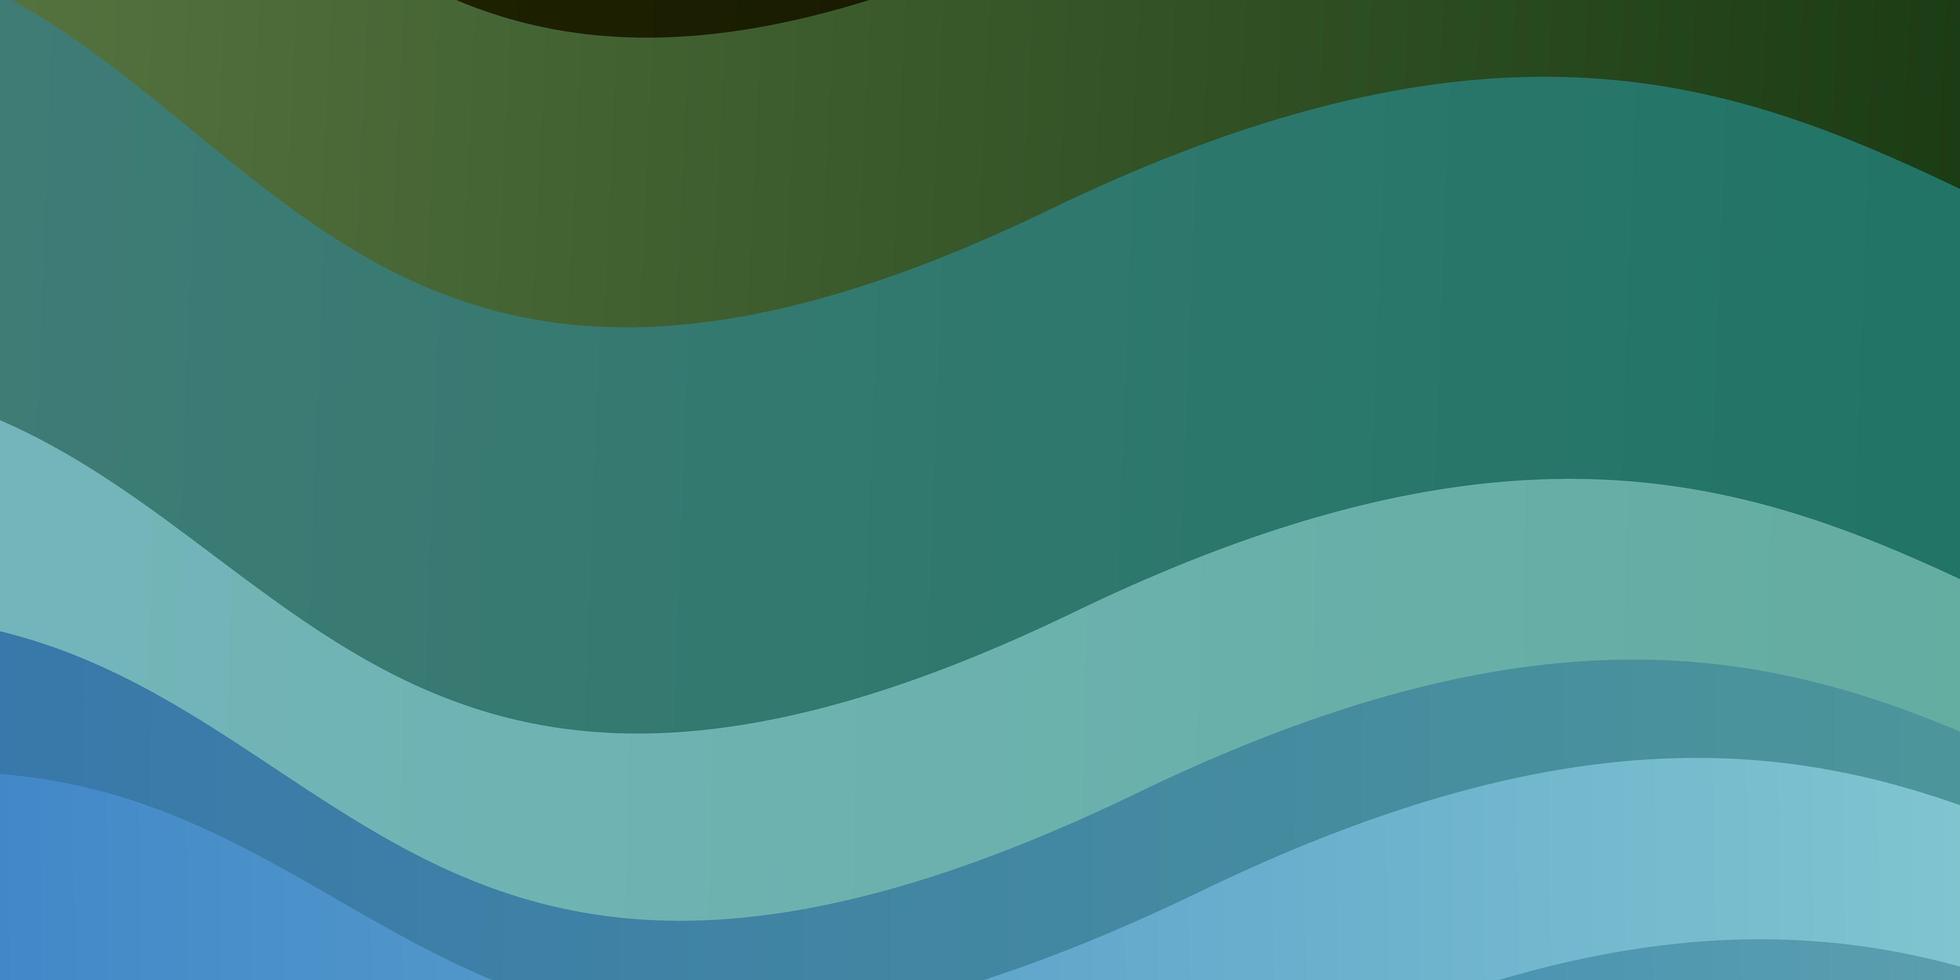 texture de vecteur bleu clair, vert avec arc circulaire.